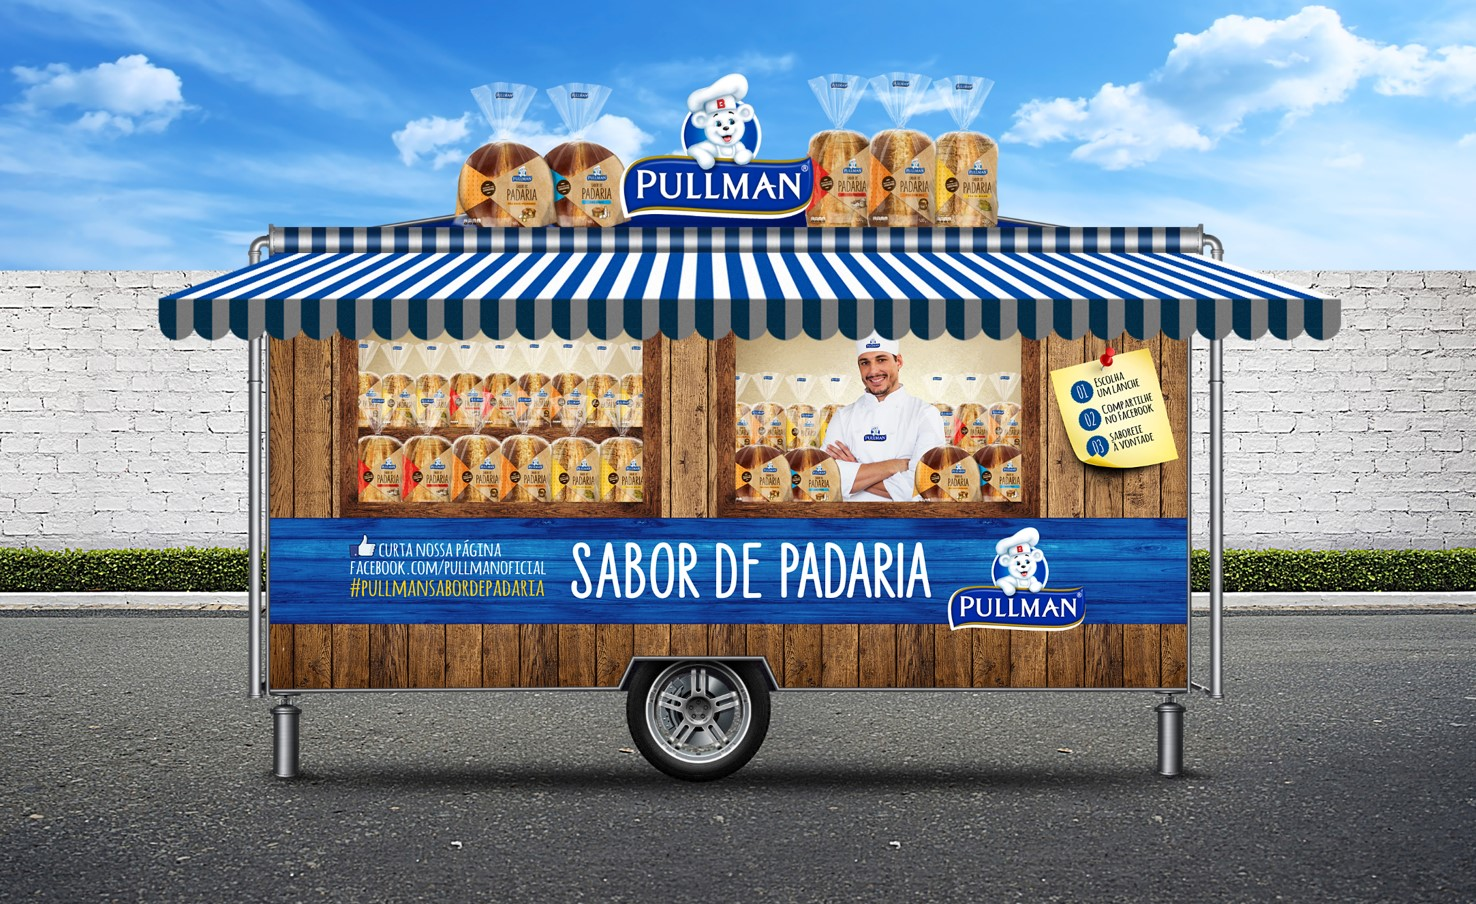 Padaria Artesanato Do Sabor ~ no Stillo Trailer Sabor de Padaria percorre S u00e3o Paulo